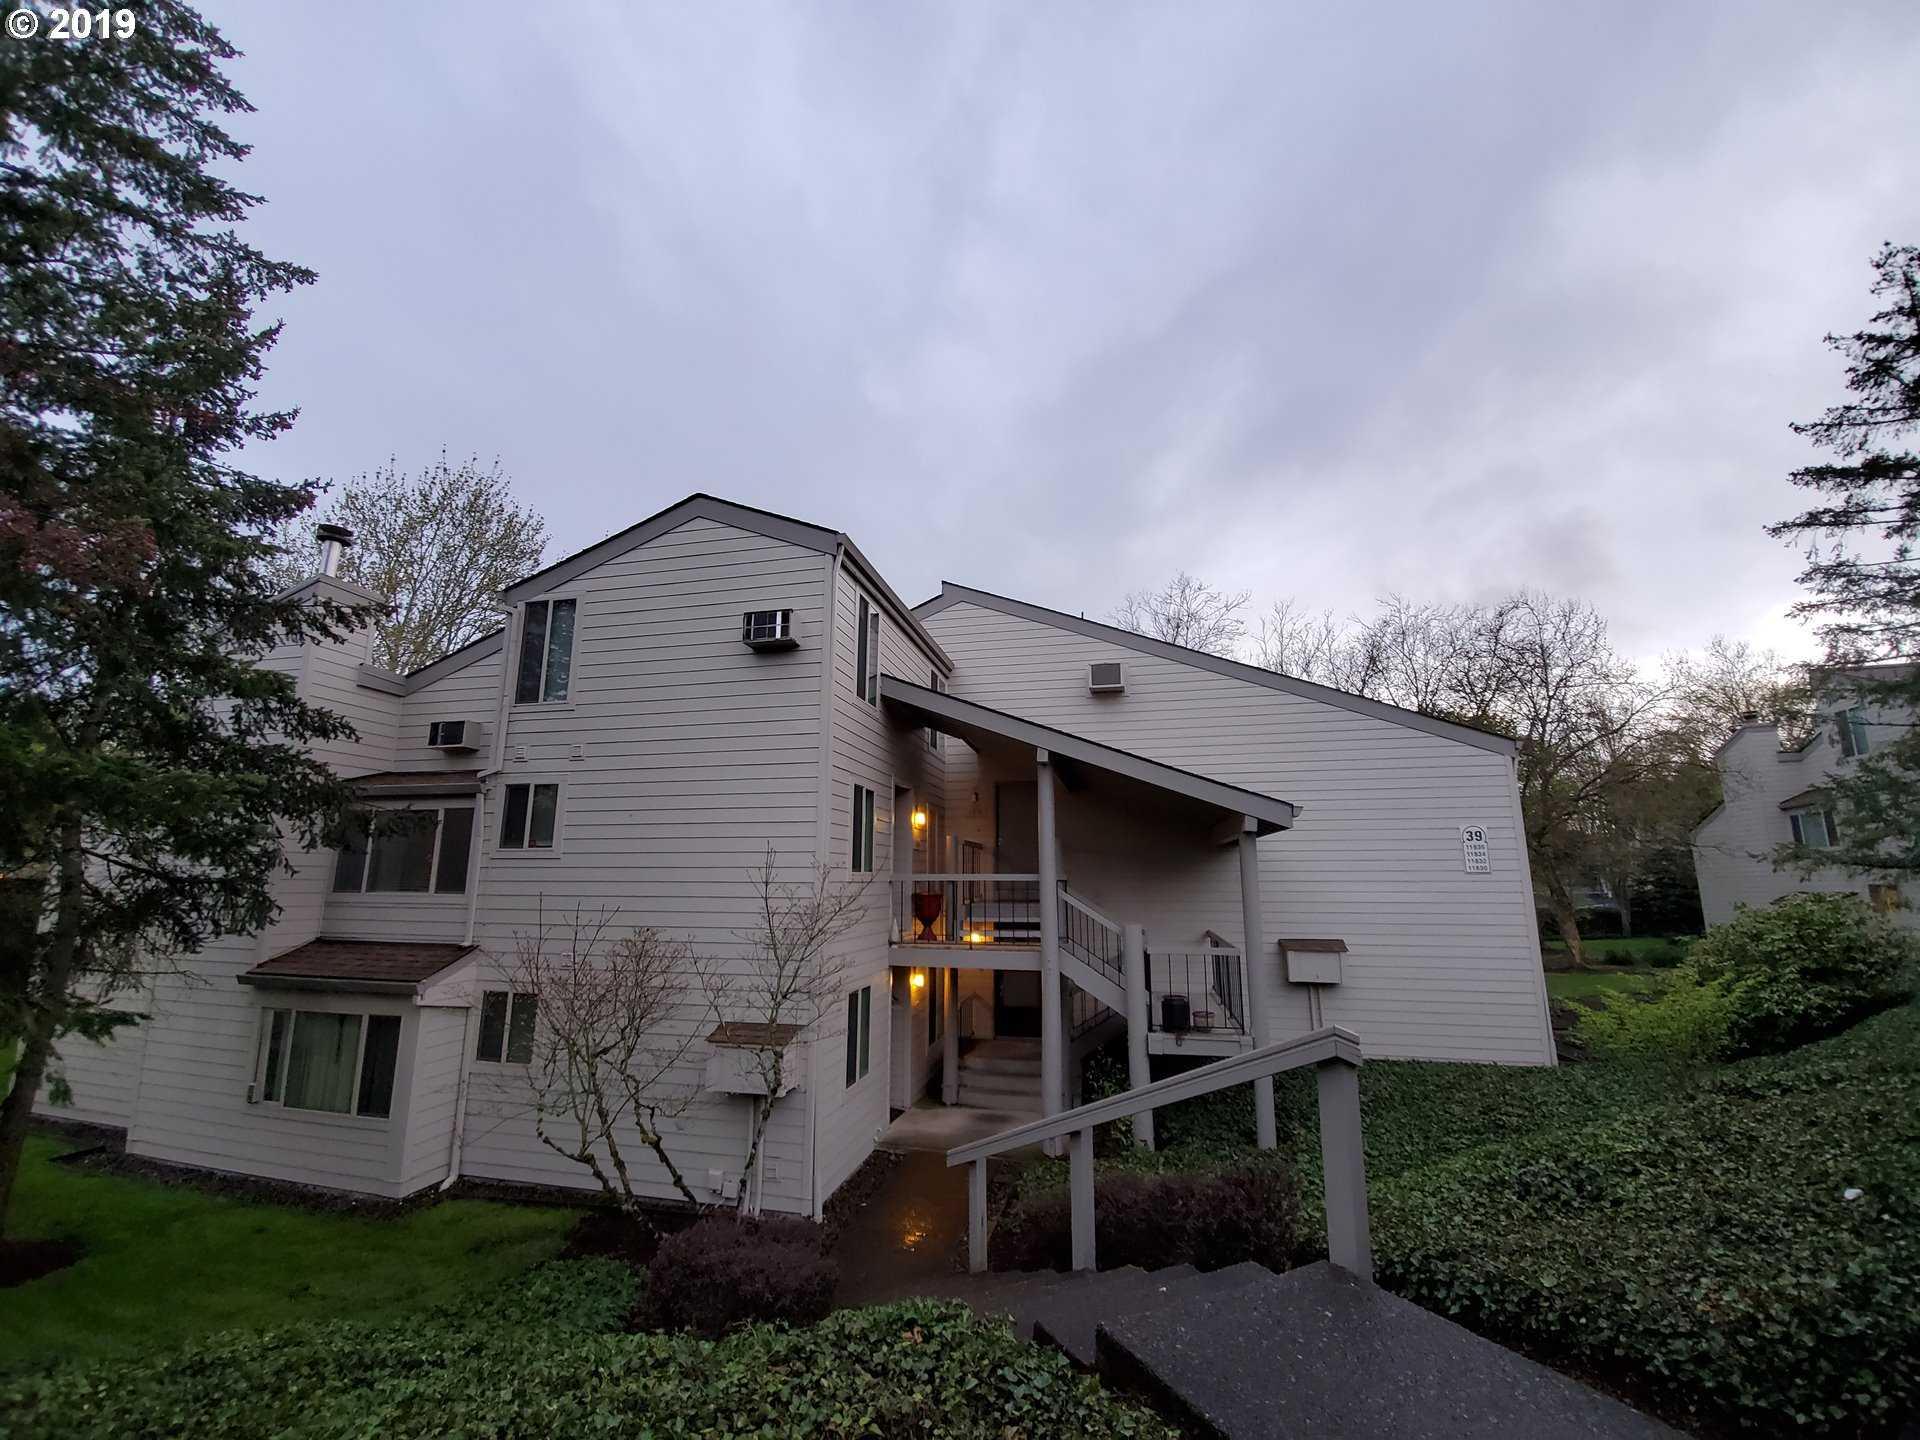 $235,000 - 3Br/2Ba -  for Sale in Beaverton